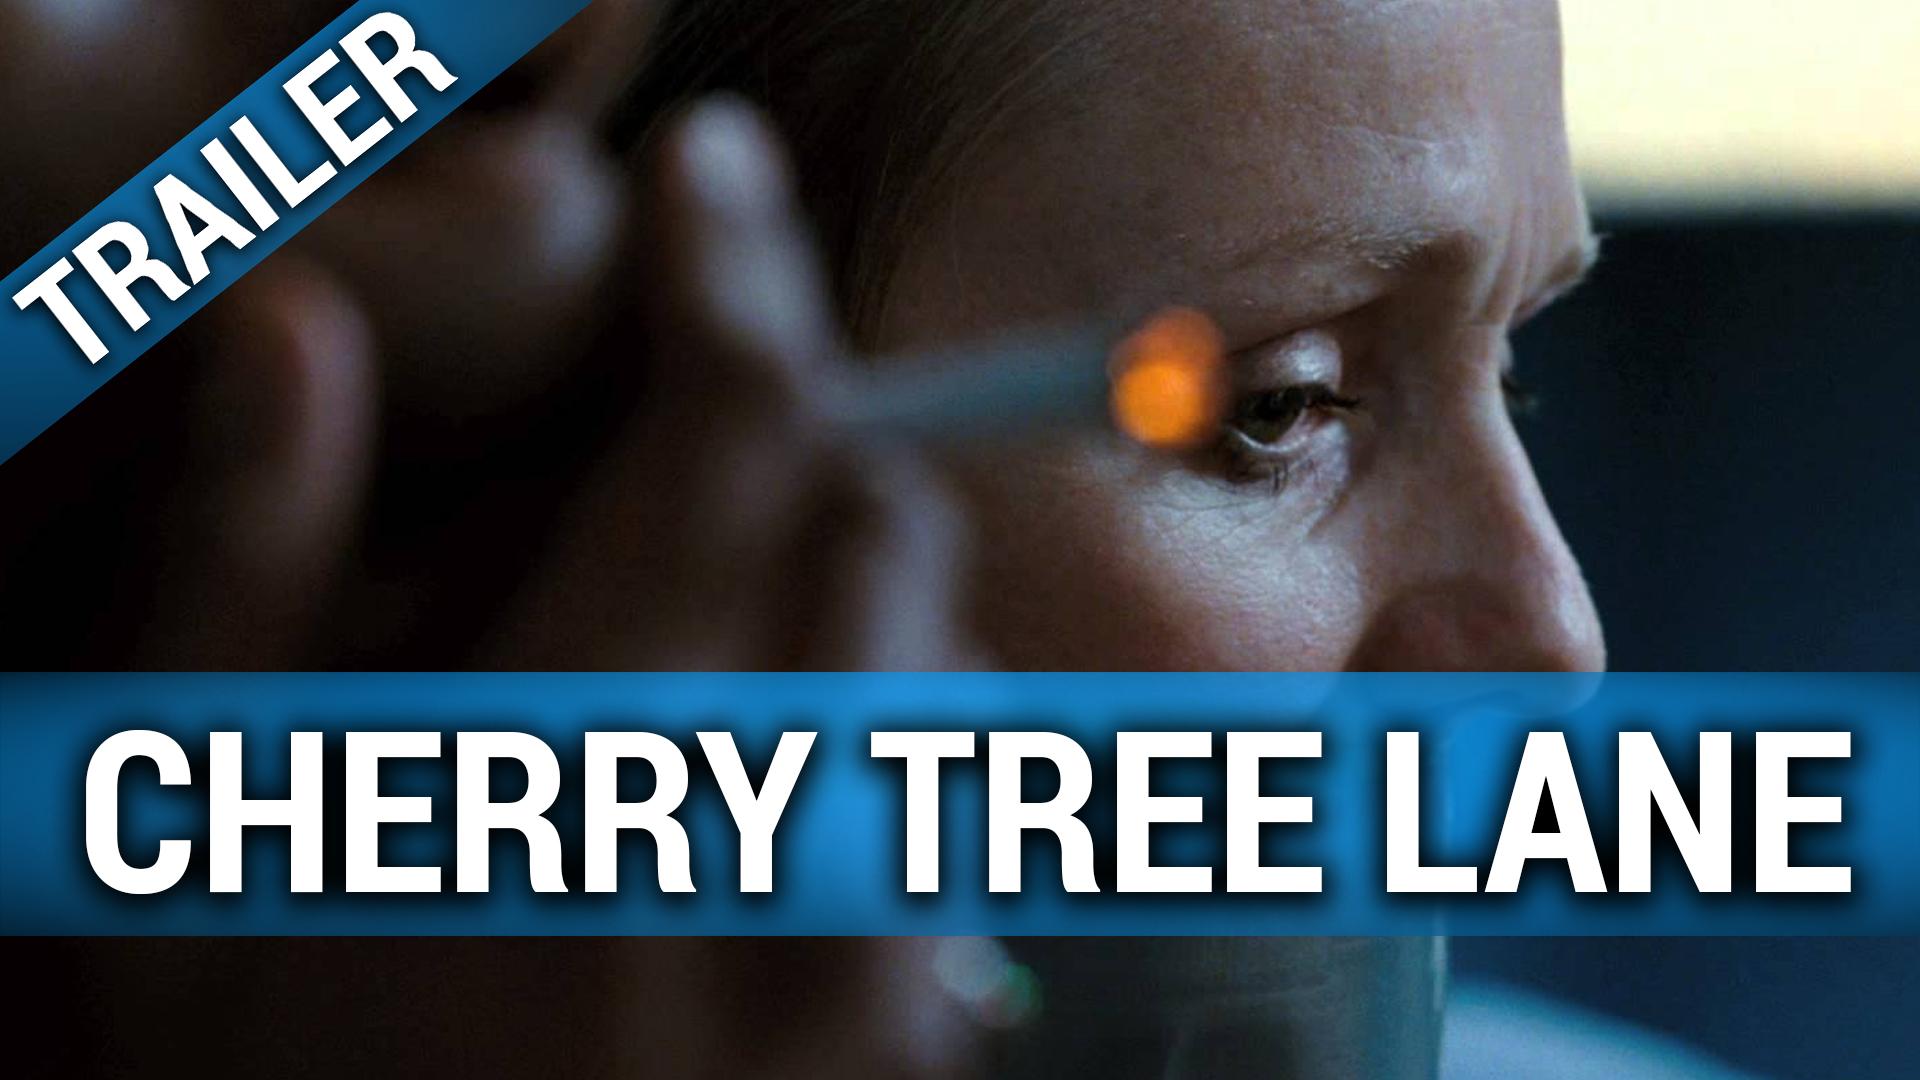 cherry tree lane 2010 trailer